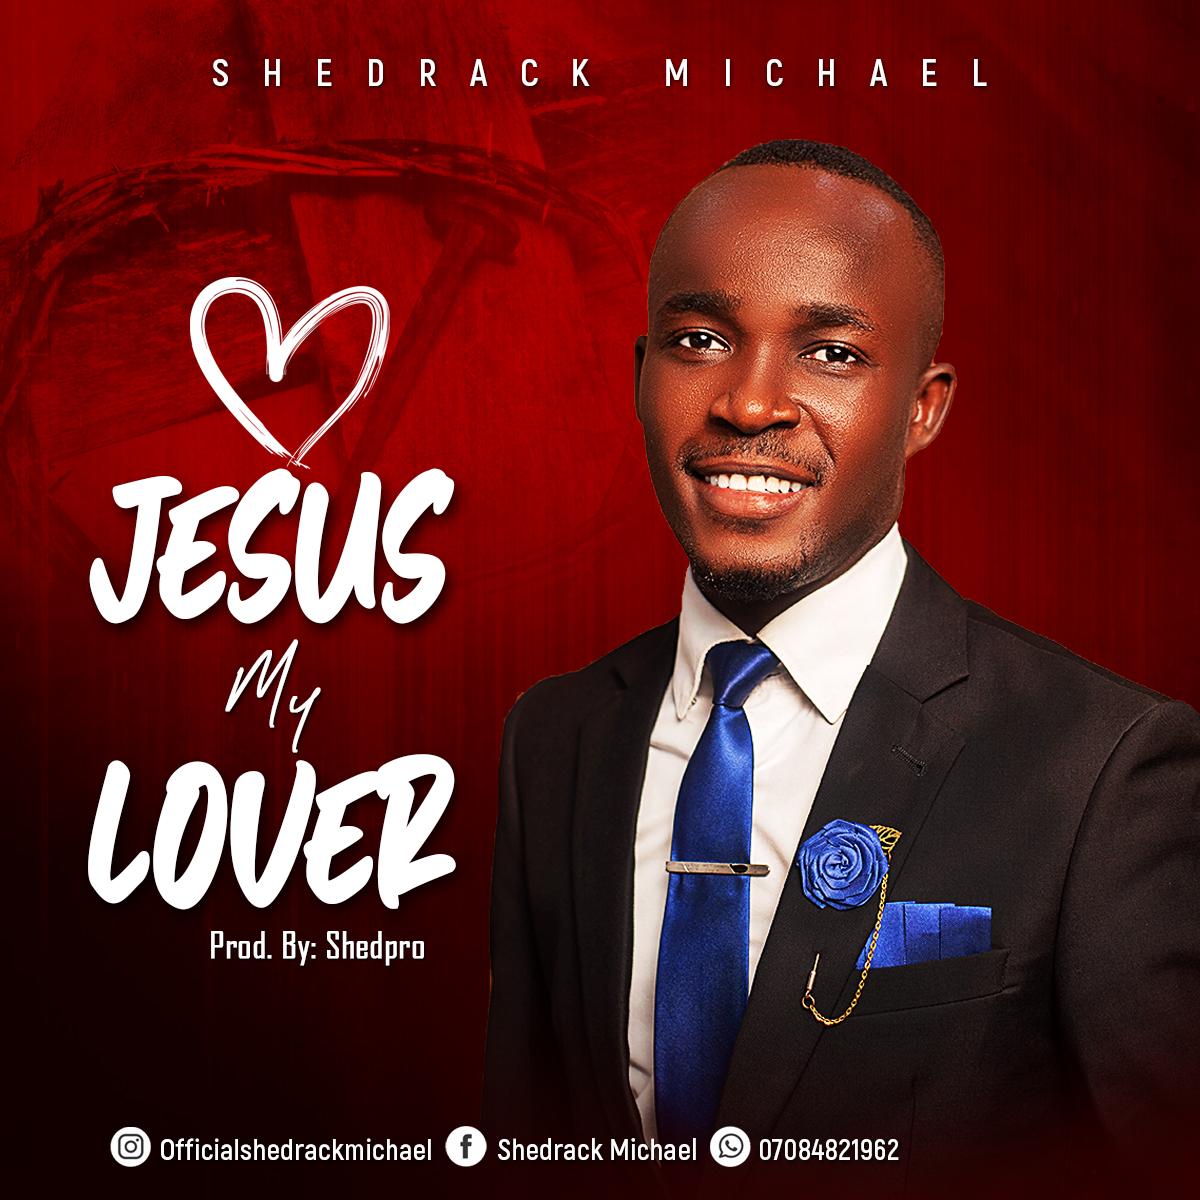 [Gospel music] Shedrack Michael - Jesus my lover (prod. By SheDoro) #hypebenue